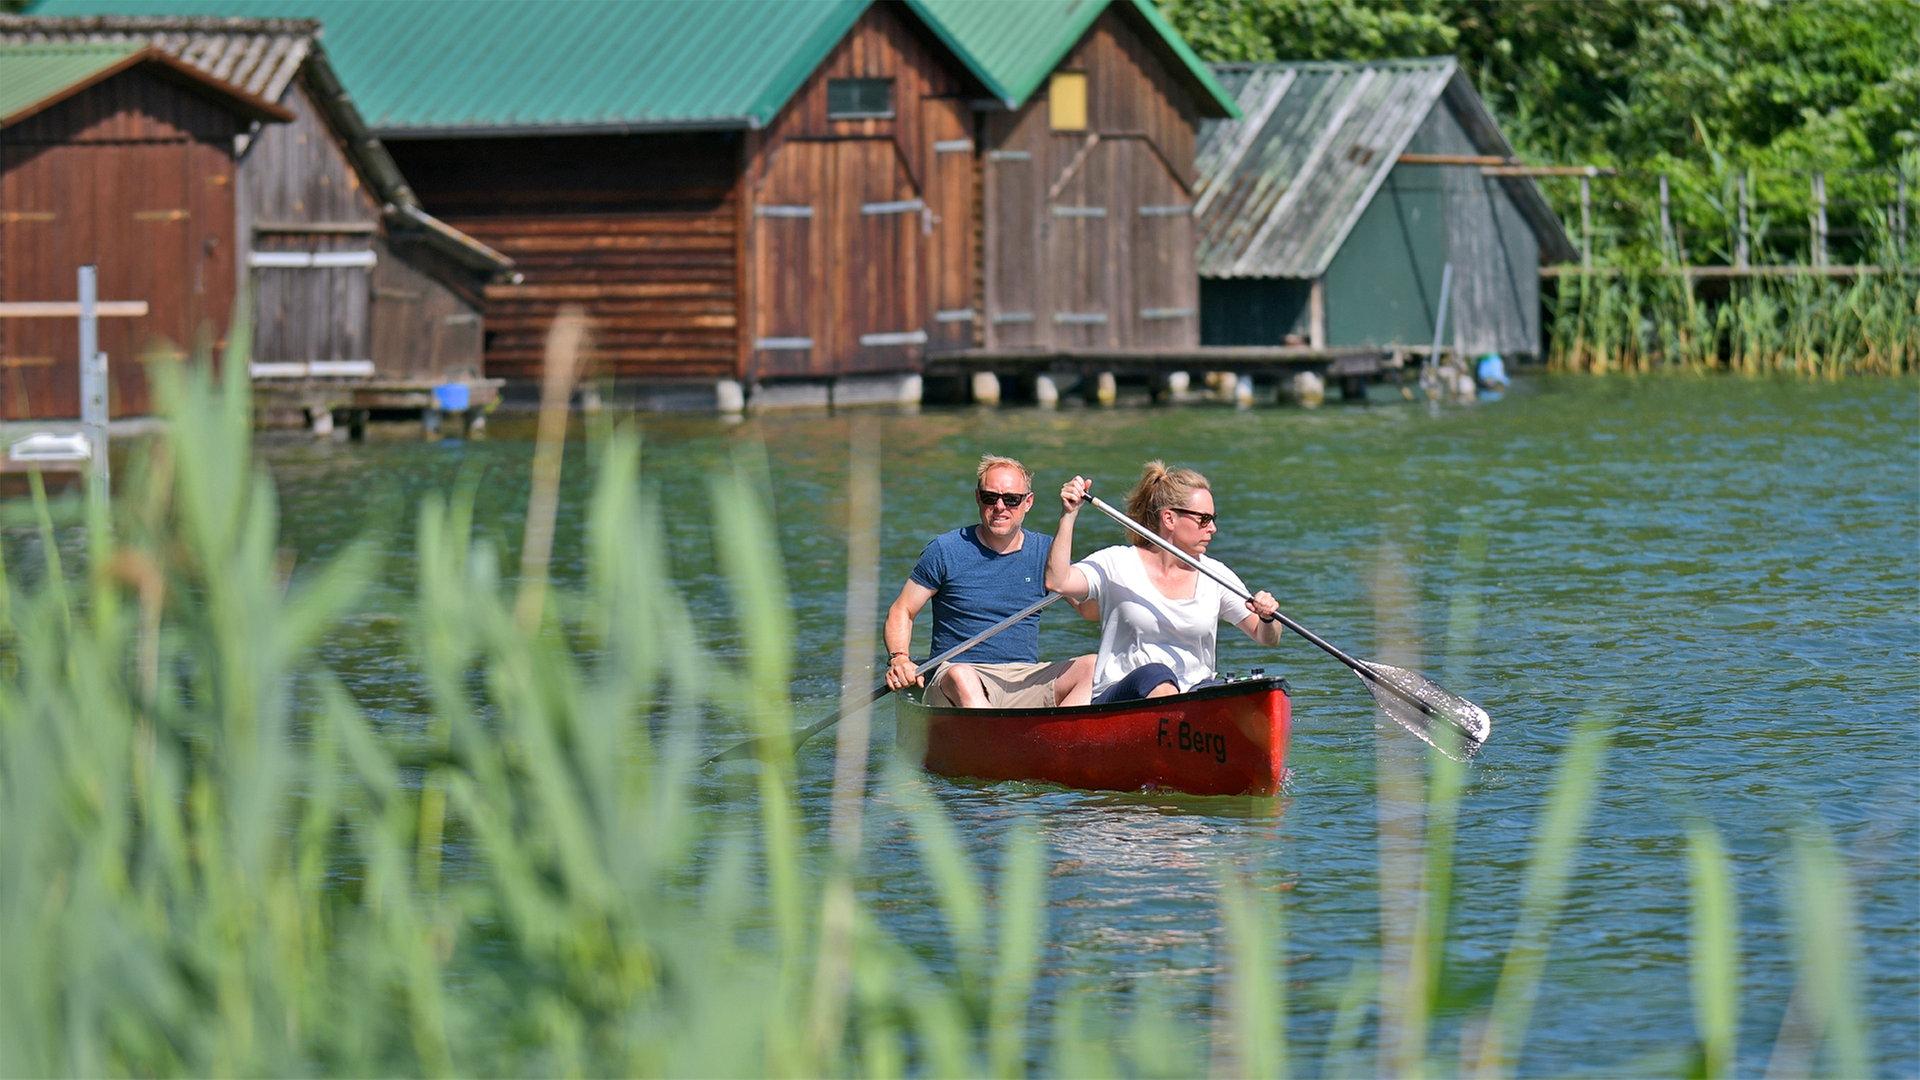 Abenteuer Kanu Tour Die Feldberger Seenlandschaft